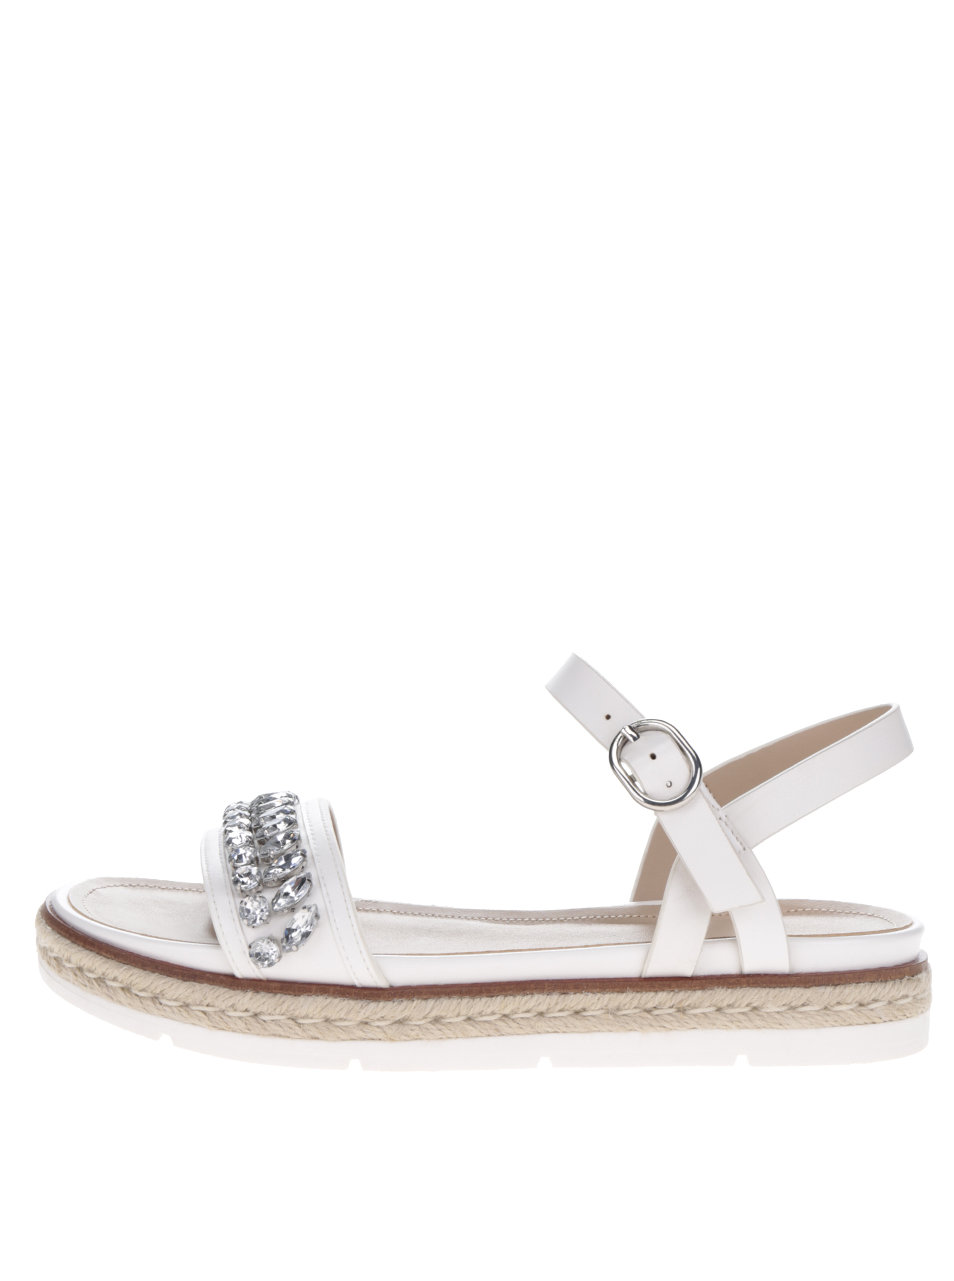 b329010c54ba Biele dámske sandále s ozdobnými kamienkami ALDO Kelvyna ...